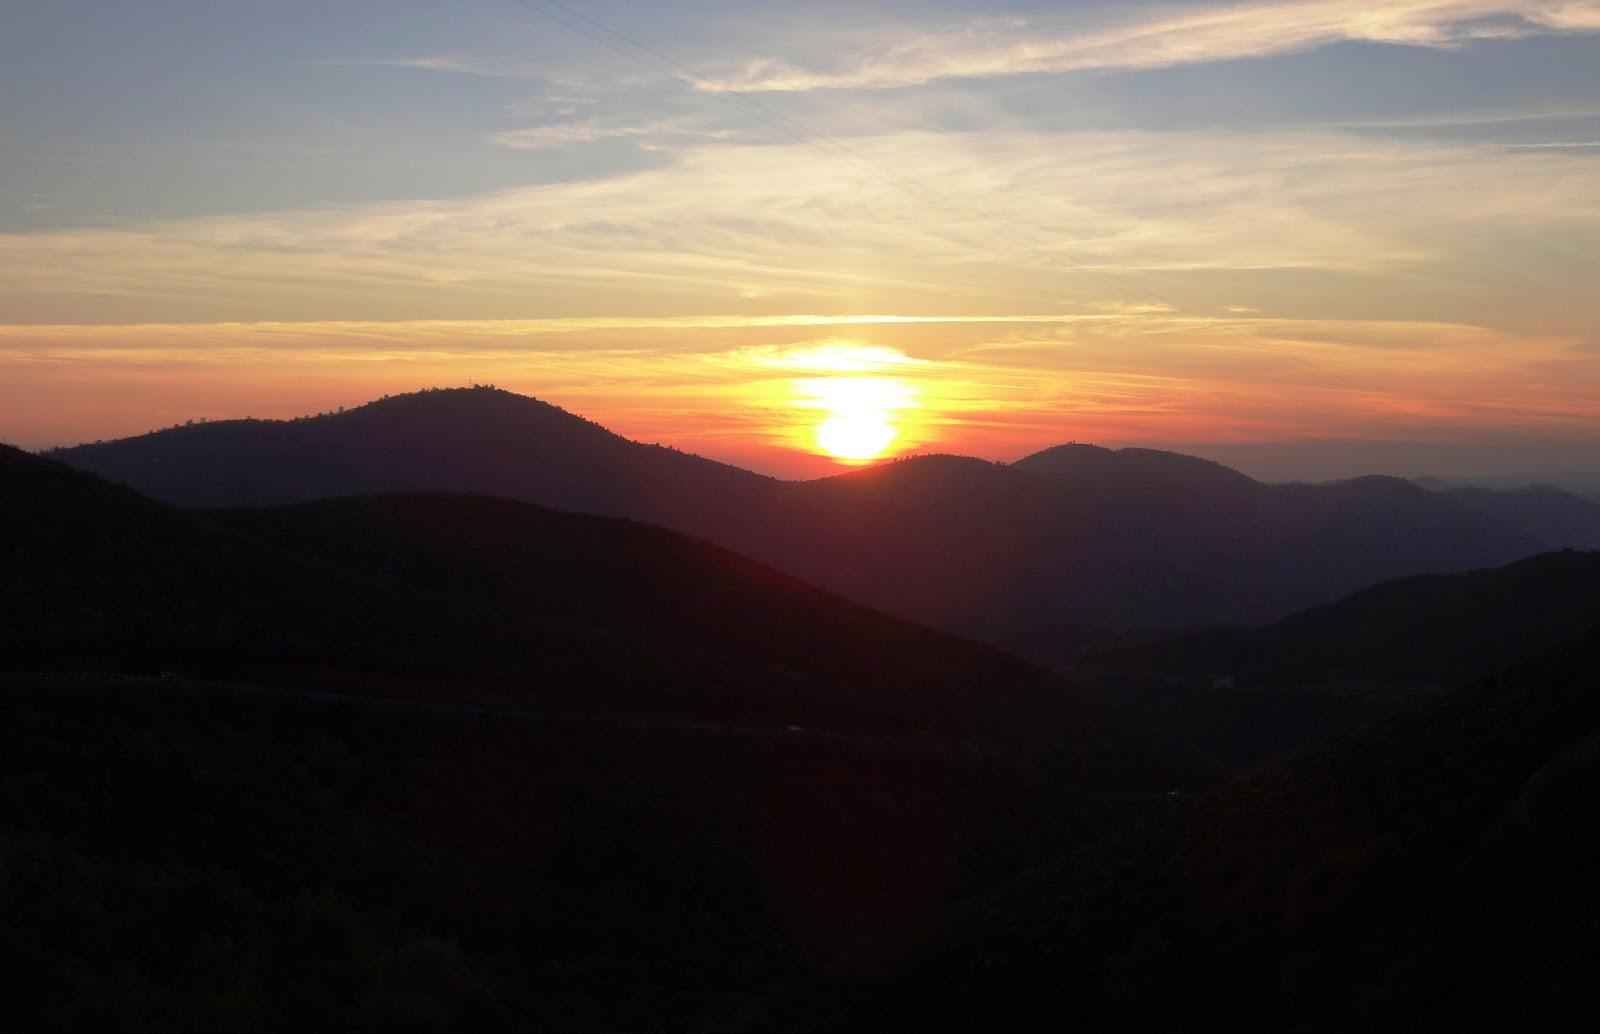 Yosemite National Park Sunset Exploring My Life